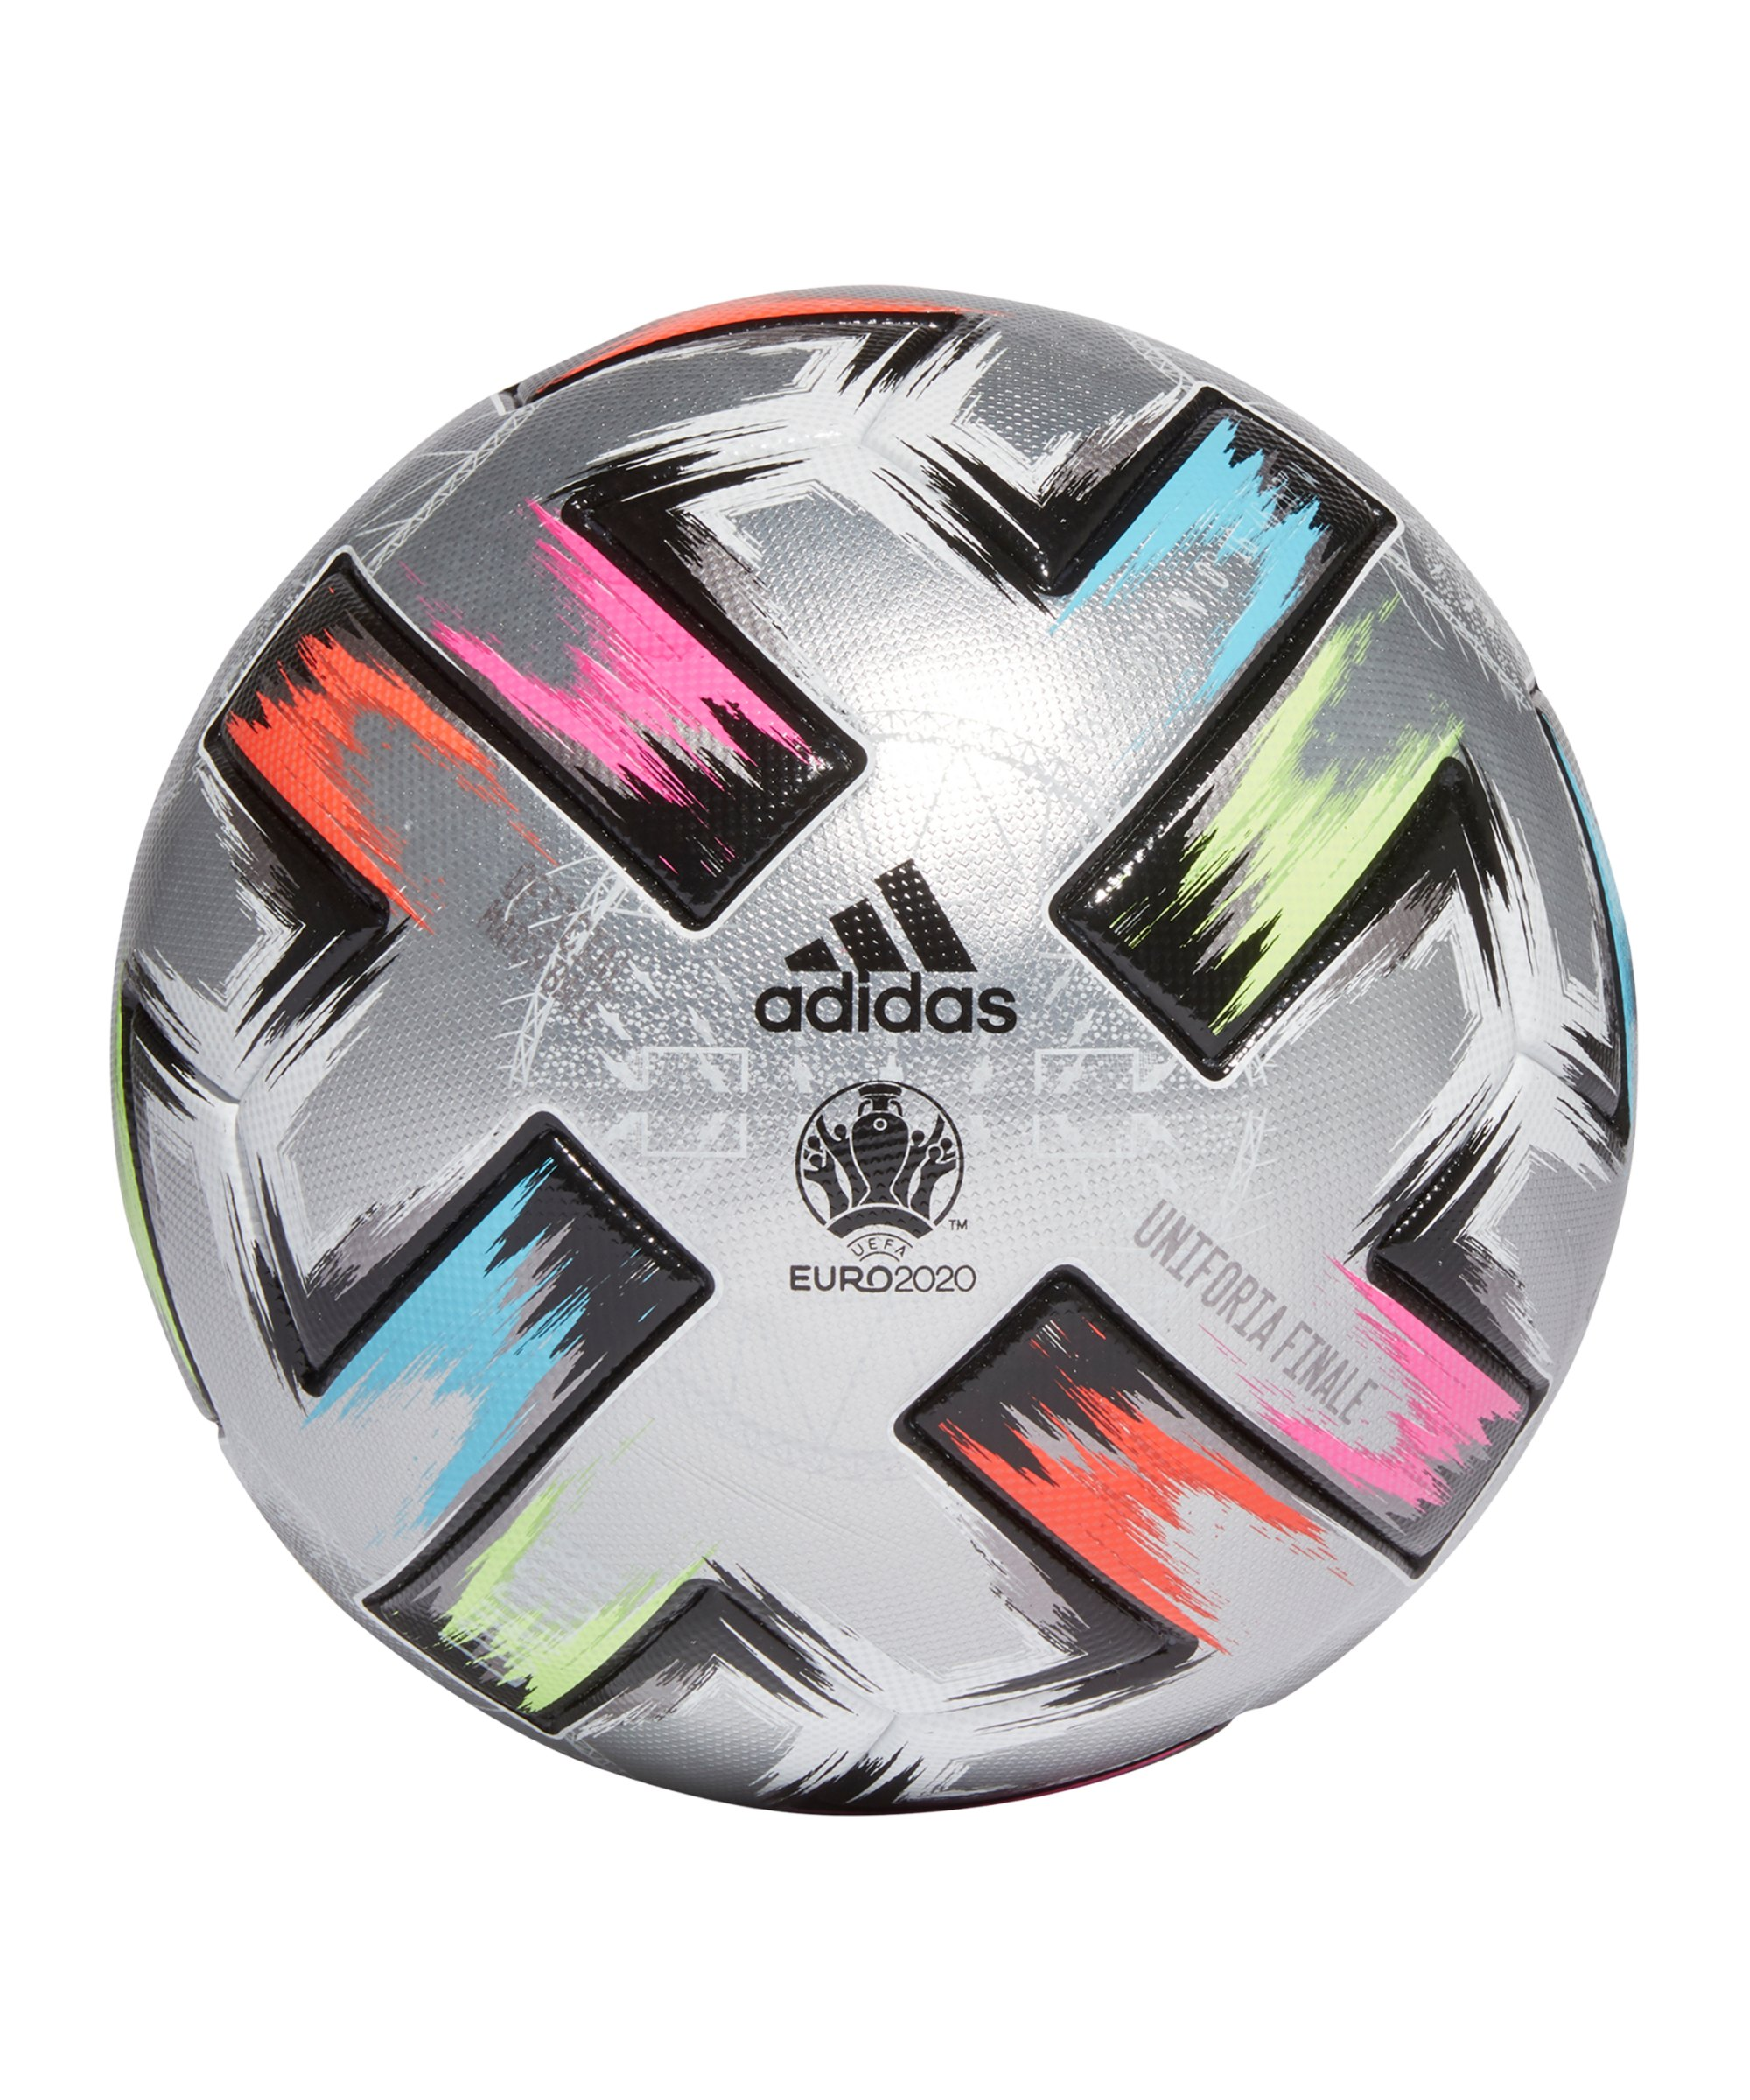 adidas Uniforia Finale Pro Spielball Silber - silber